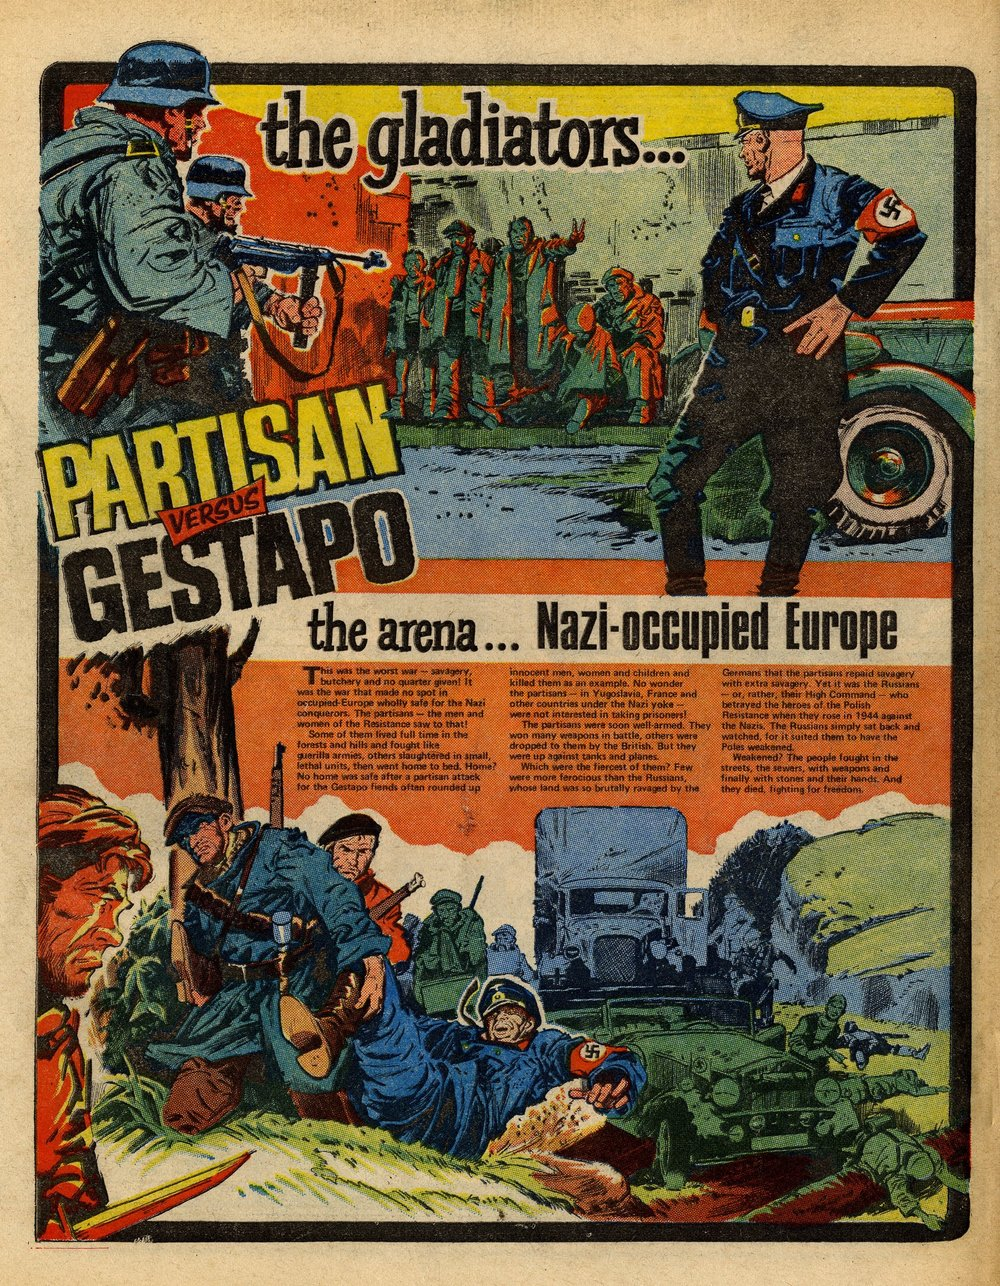 Partisan versus Gestapo: Jim Watson (artist)